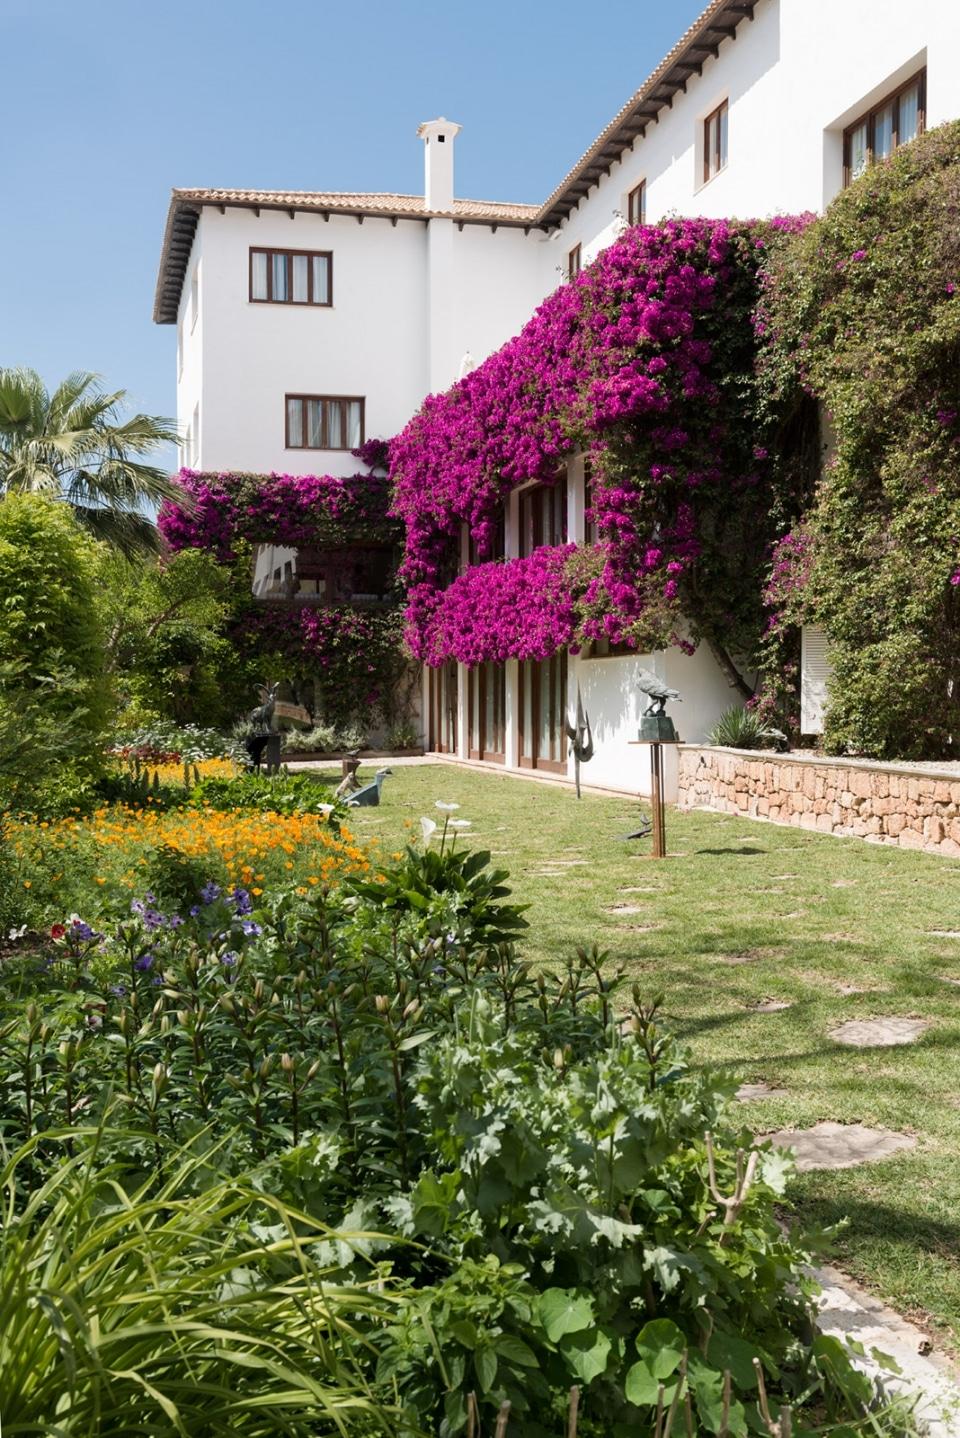 20140429 9310 960x1438 - Hotel Formentor in Spring